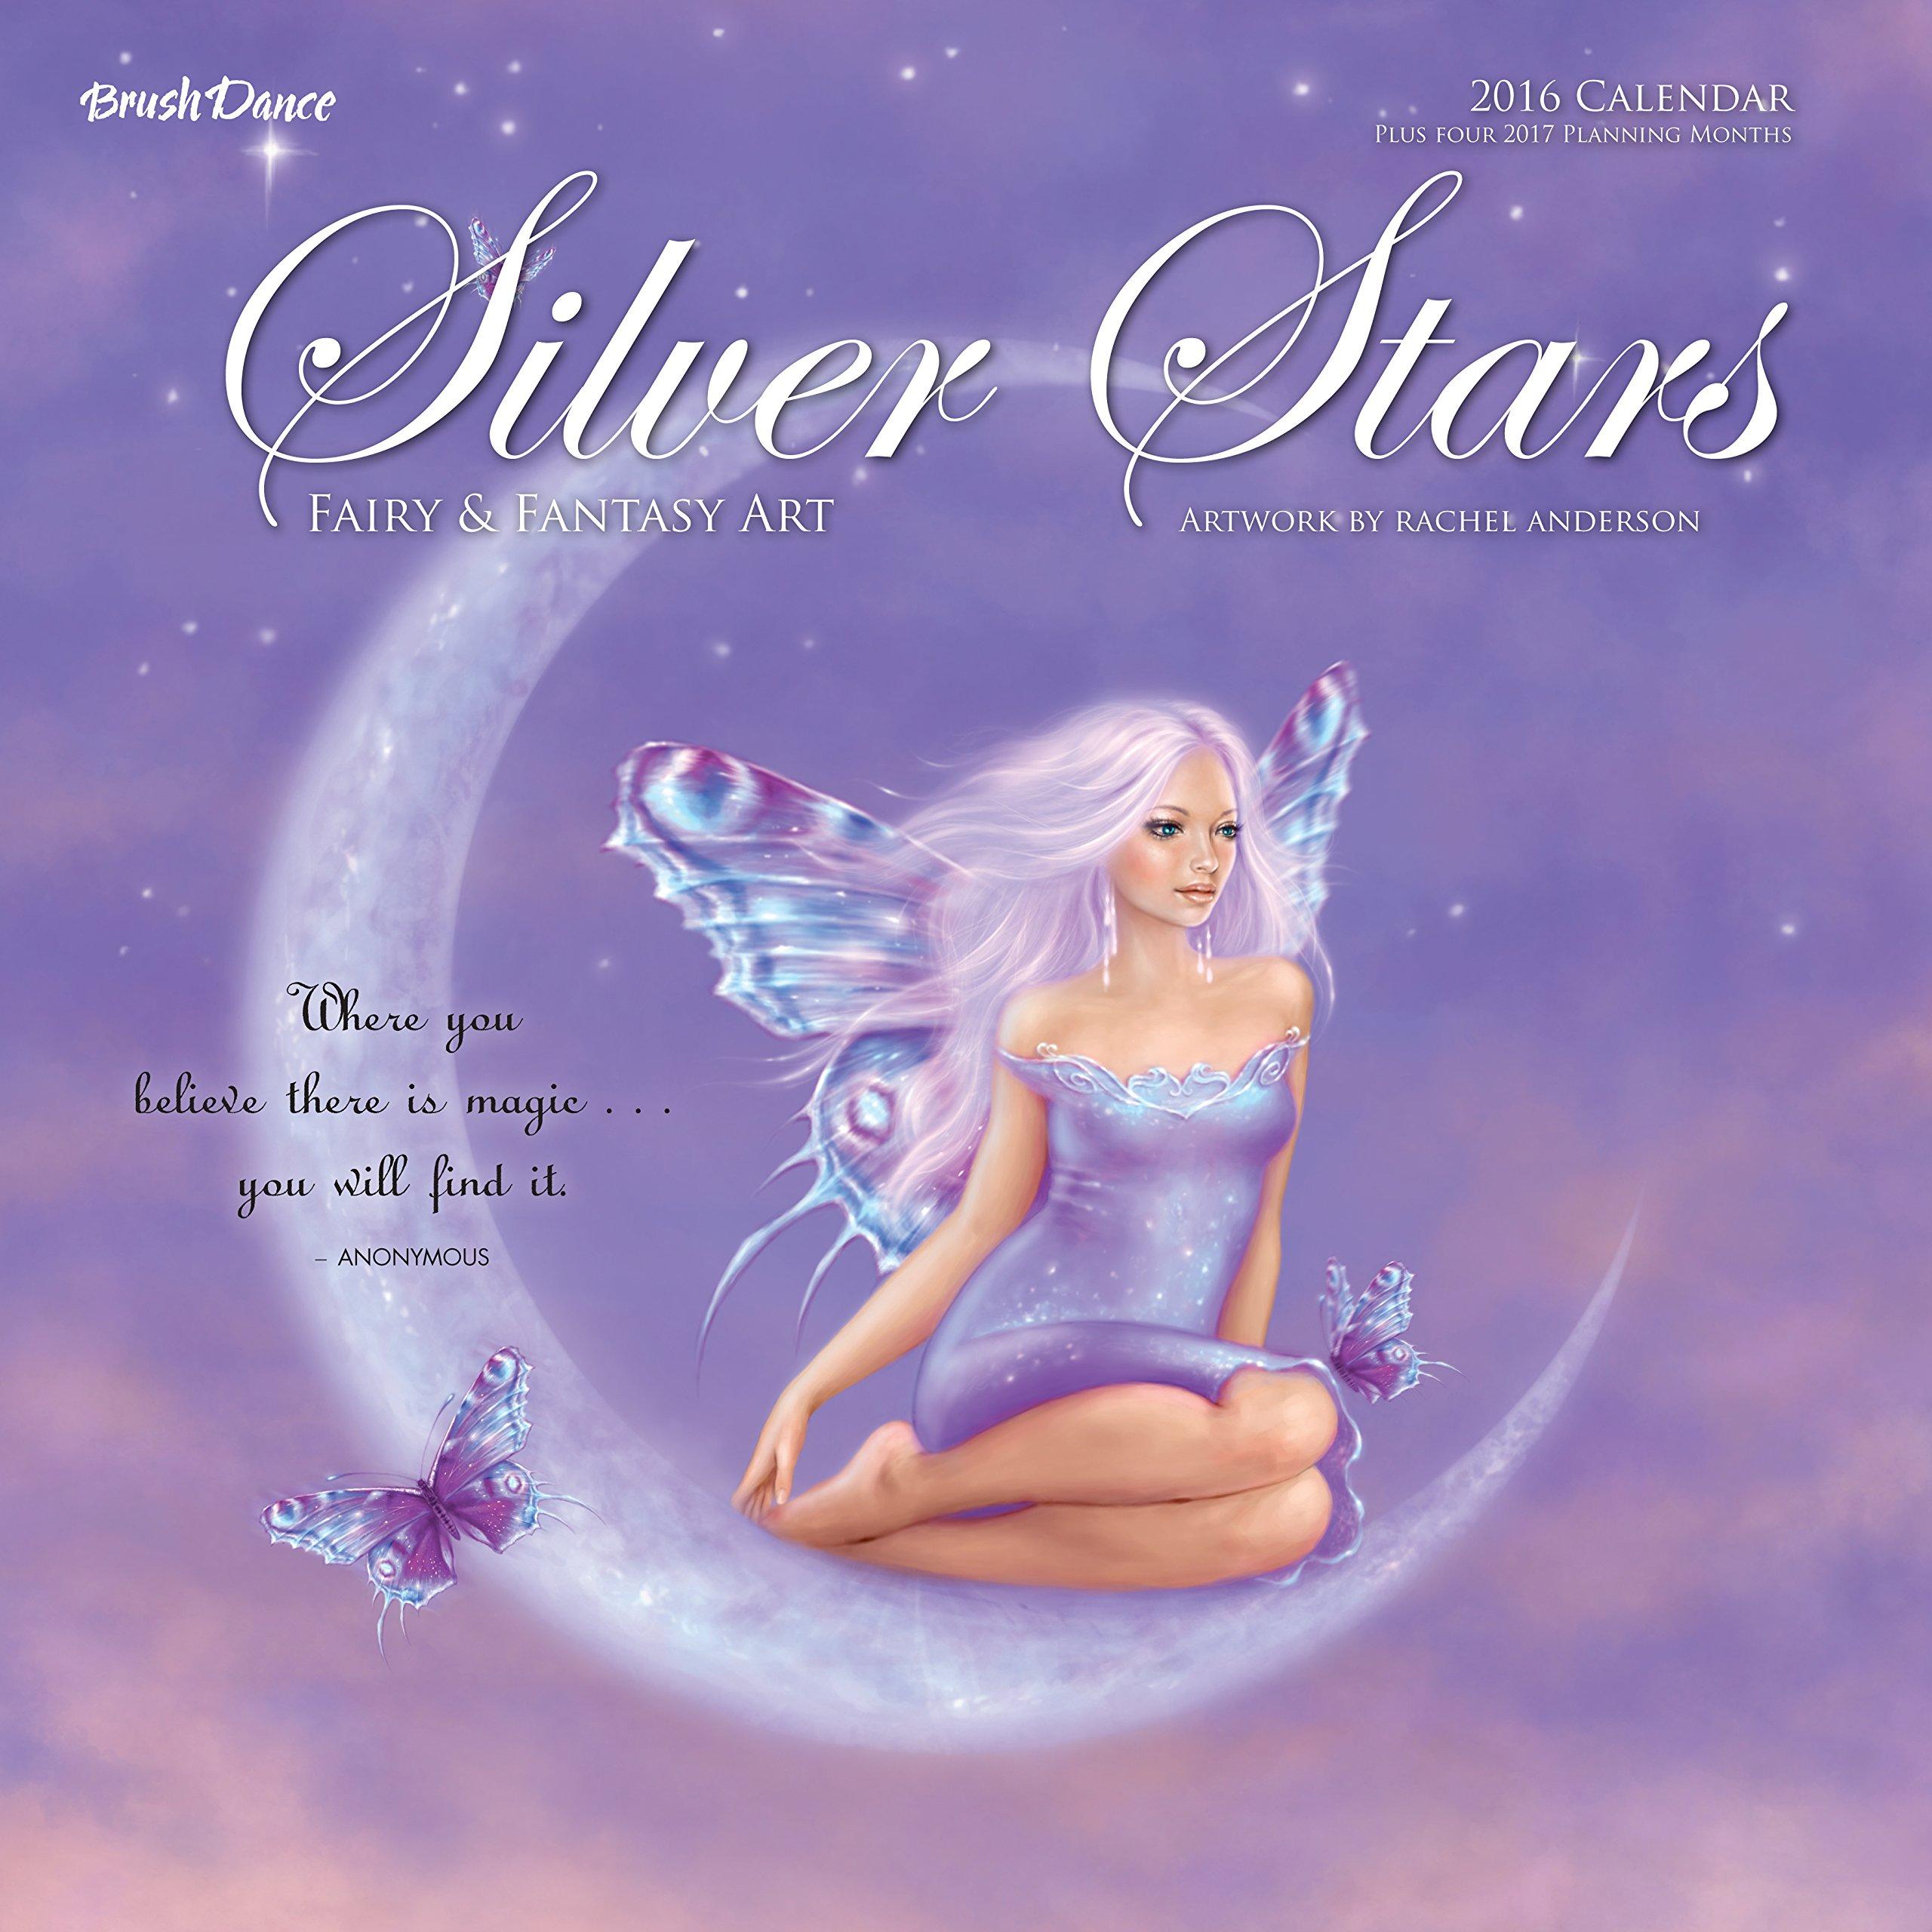 ... silverstarlets co の 画像 一覧 bird s eye view silverstarlets co: 6gazo.ebb.jp/silverstarlets.co/pic1.html